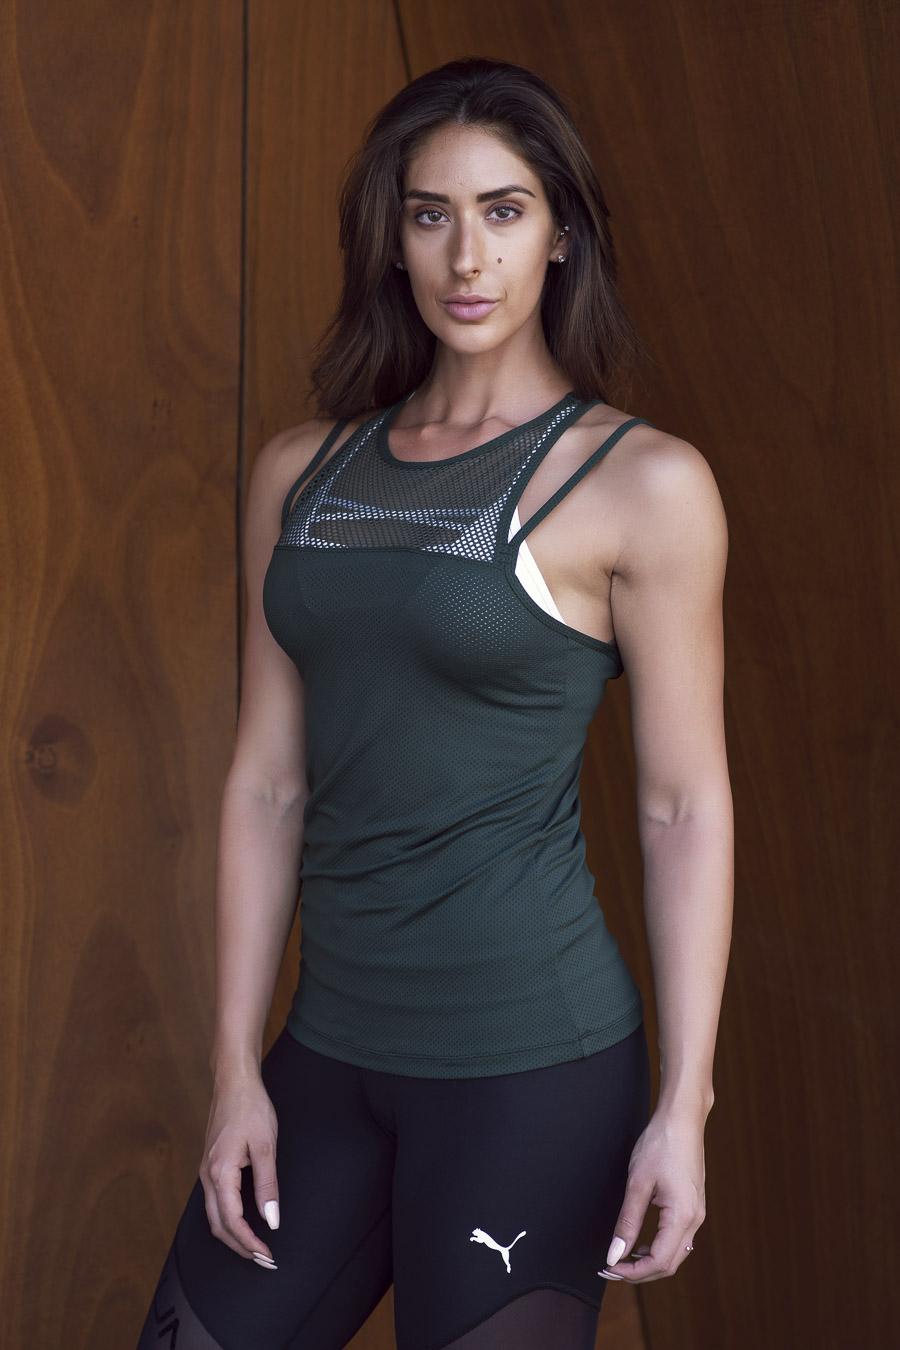 Cassie female fitness model shooting for Melbourne's fitness modelling agent